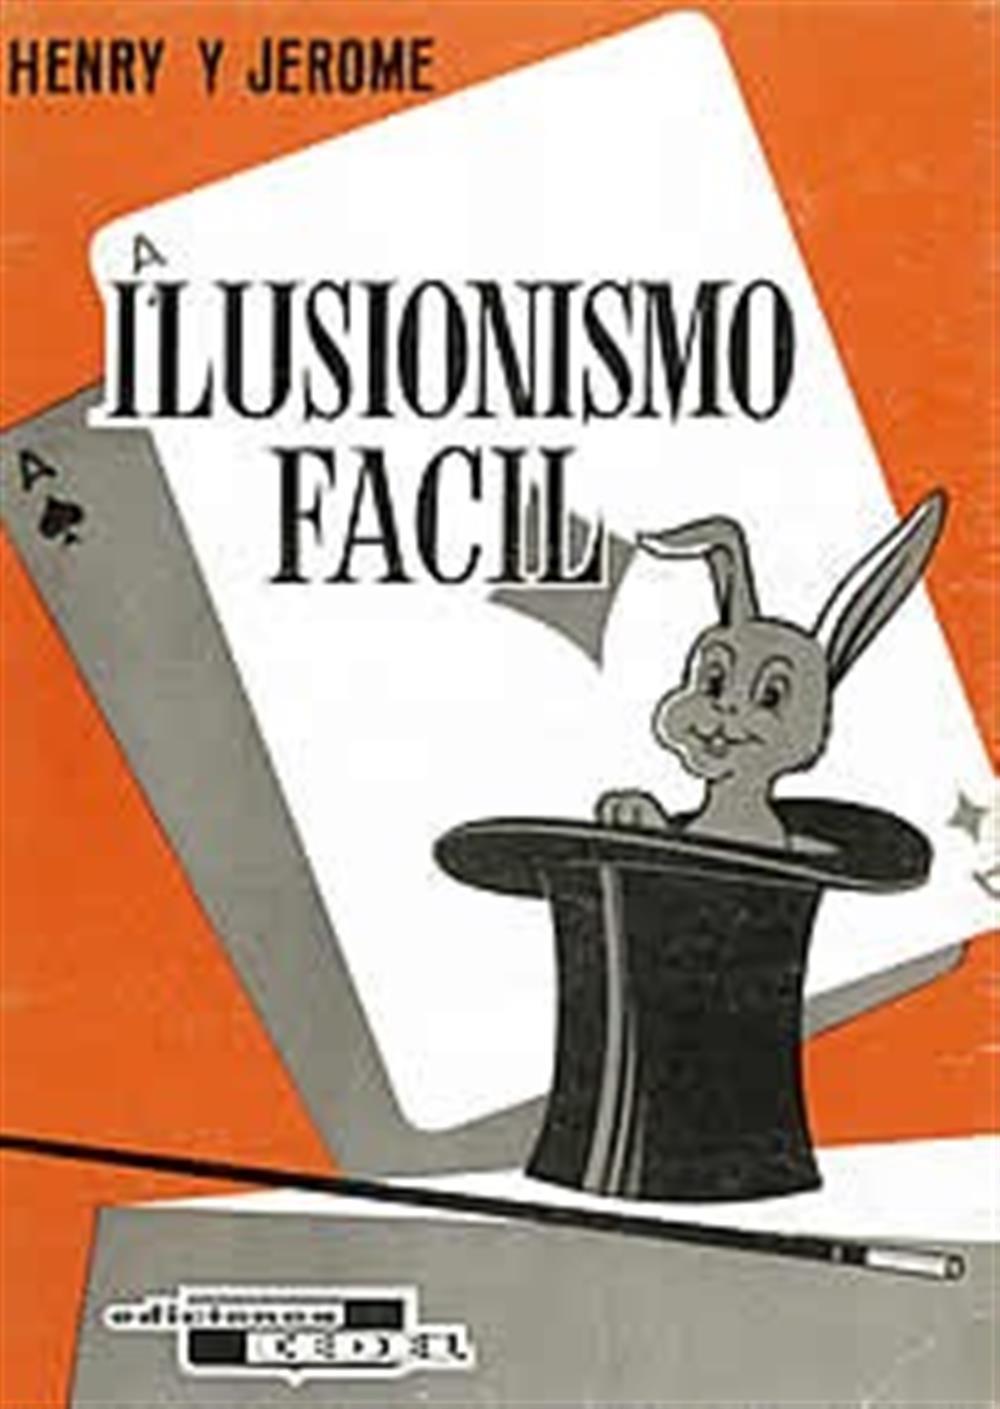 Ilusionismo fácil